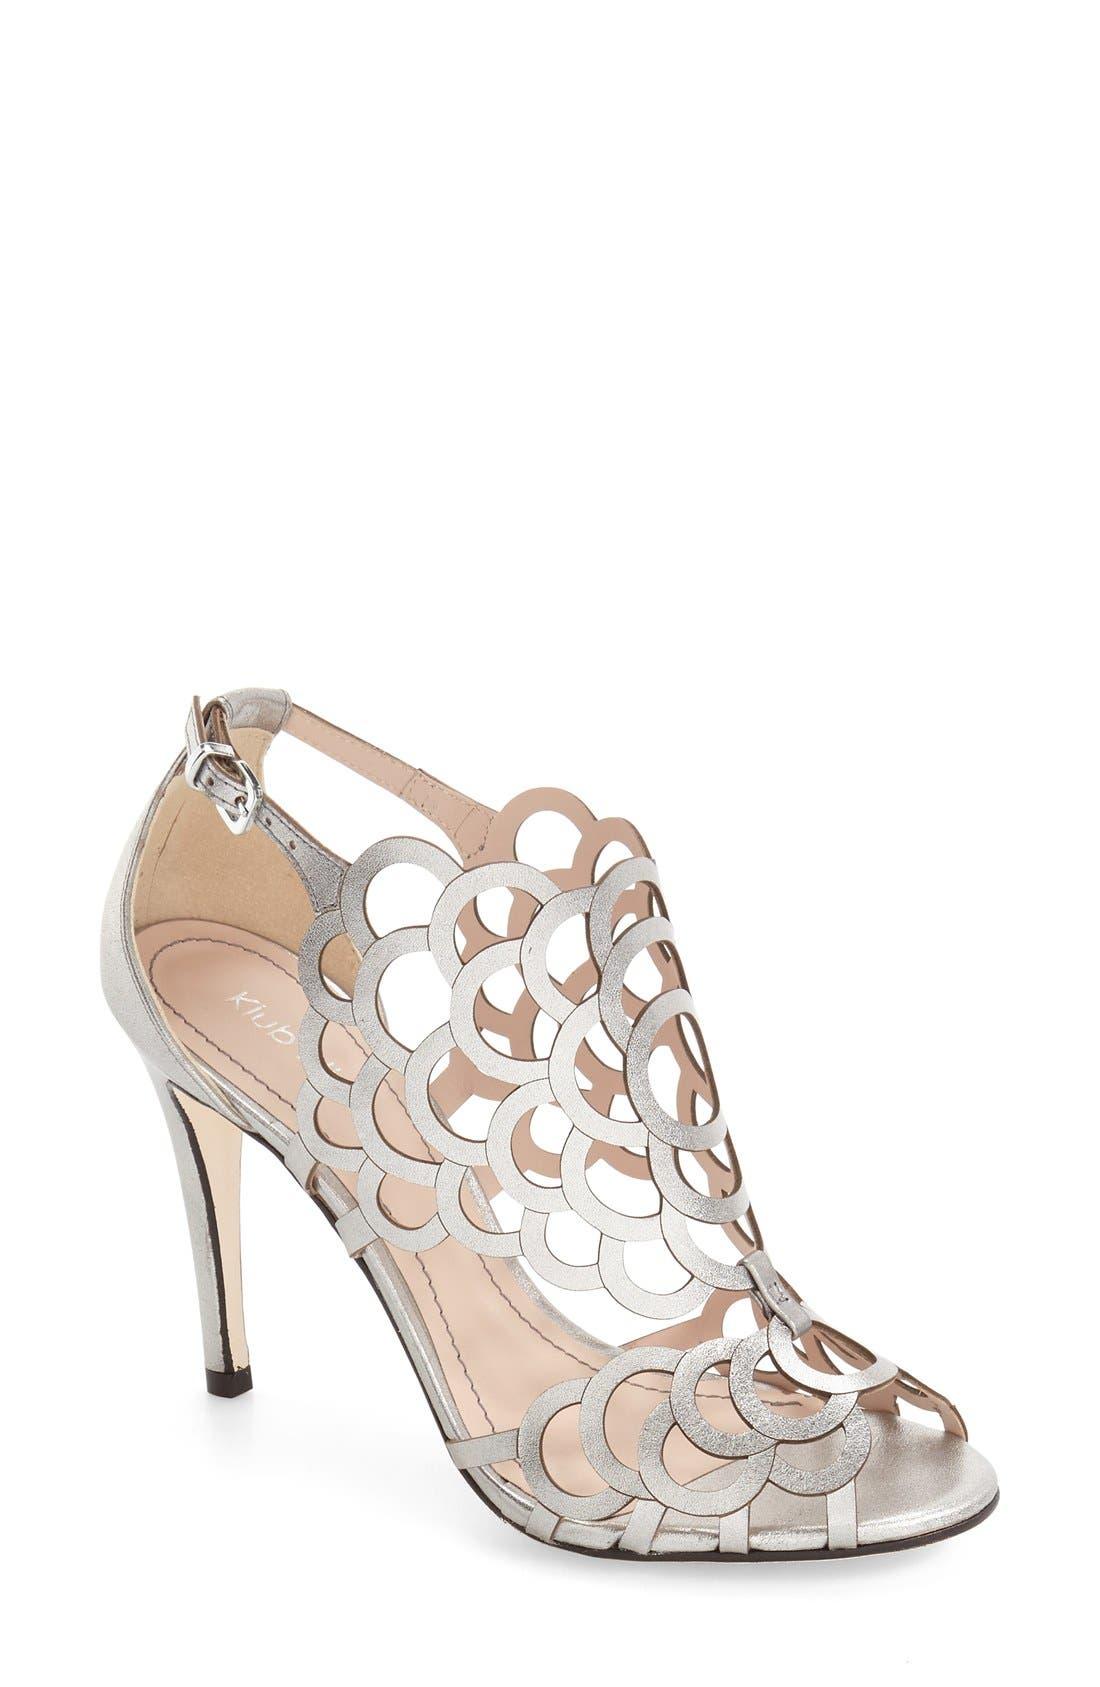 KLUB NICO 'Millie' Cutout Sandal